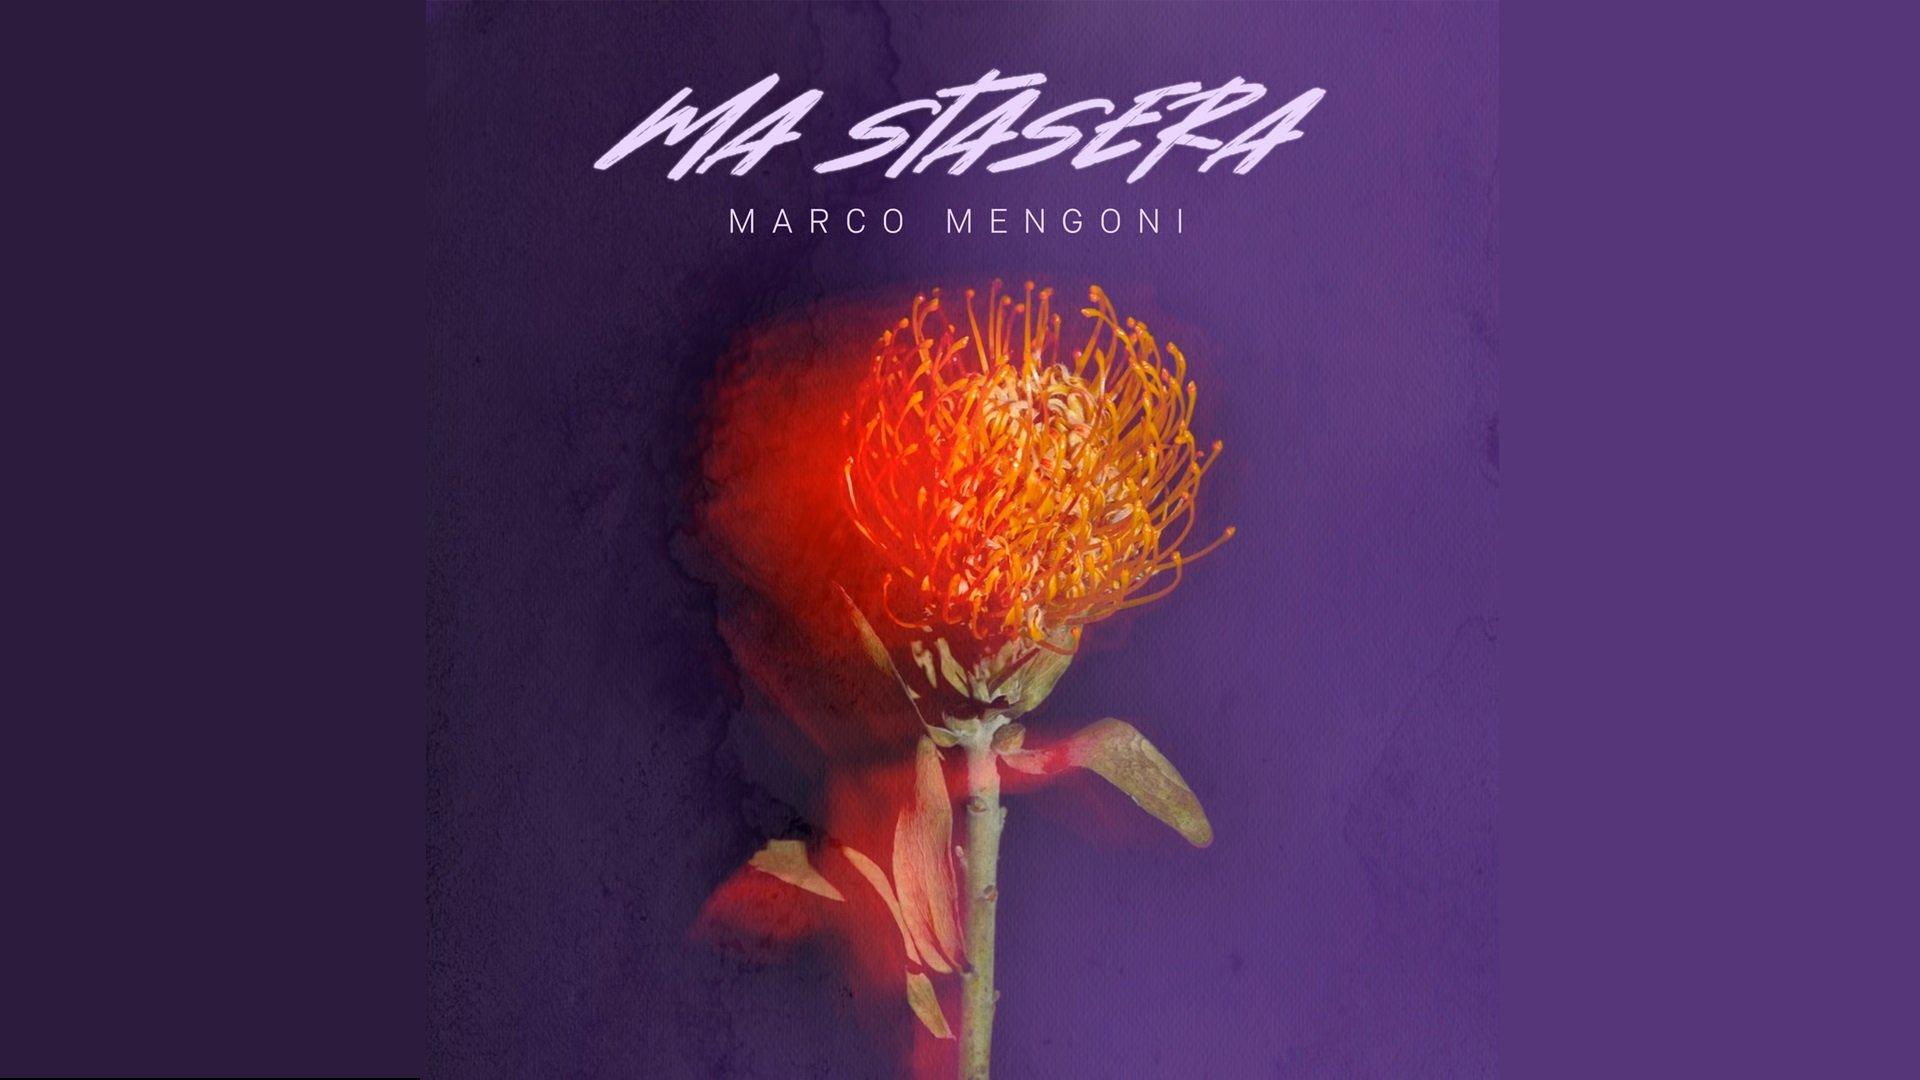 Marco Mengoni Ma Stasera 1